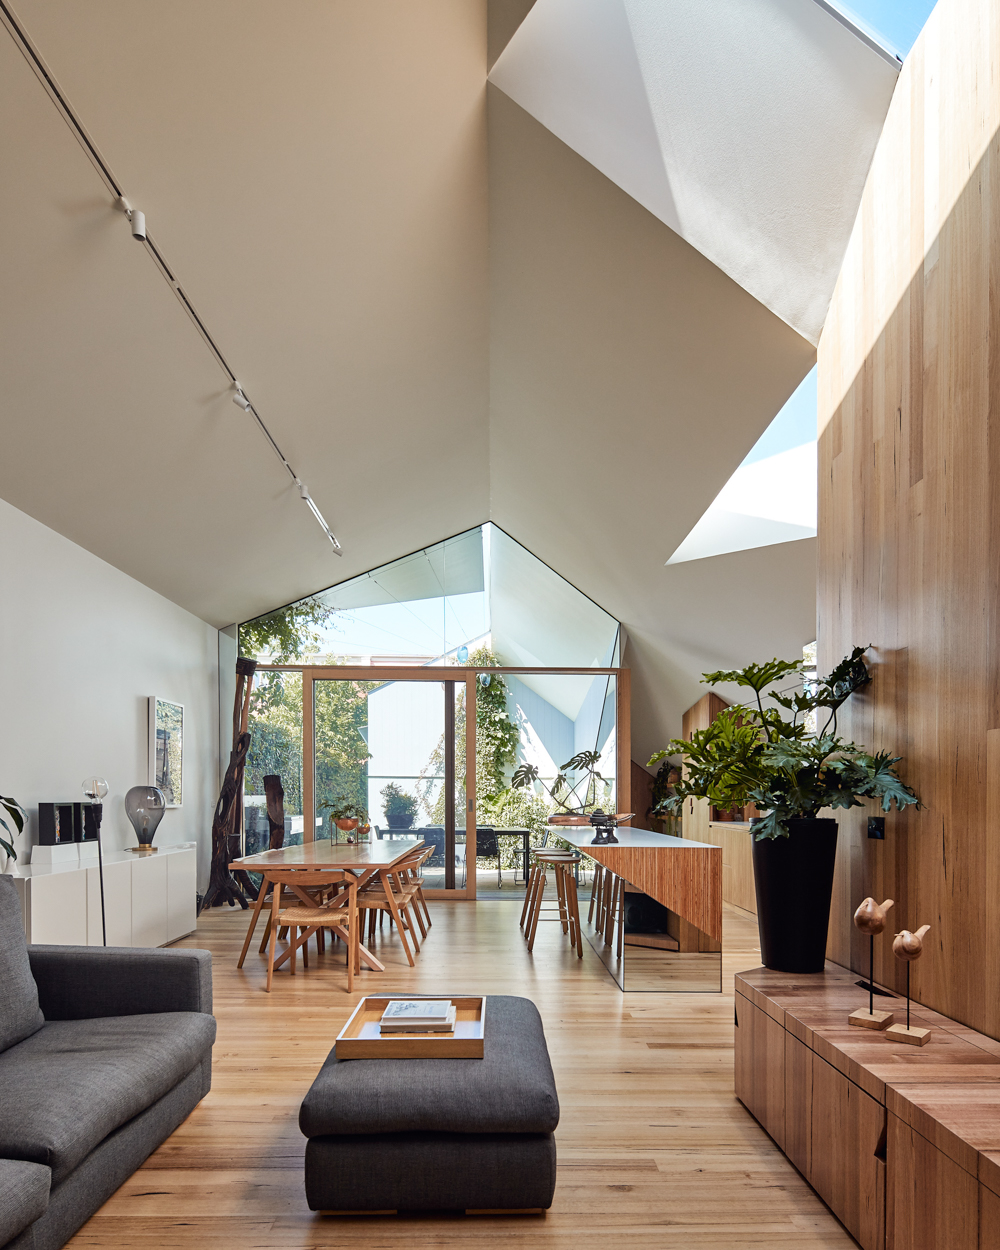 Living space design